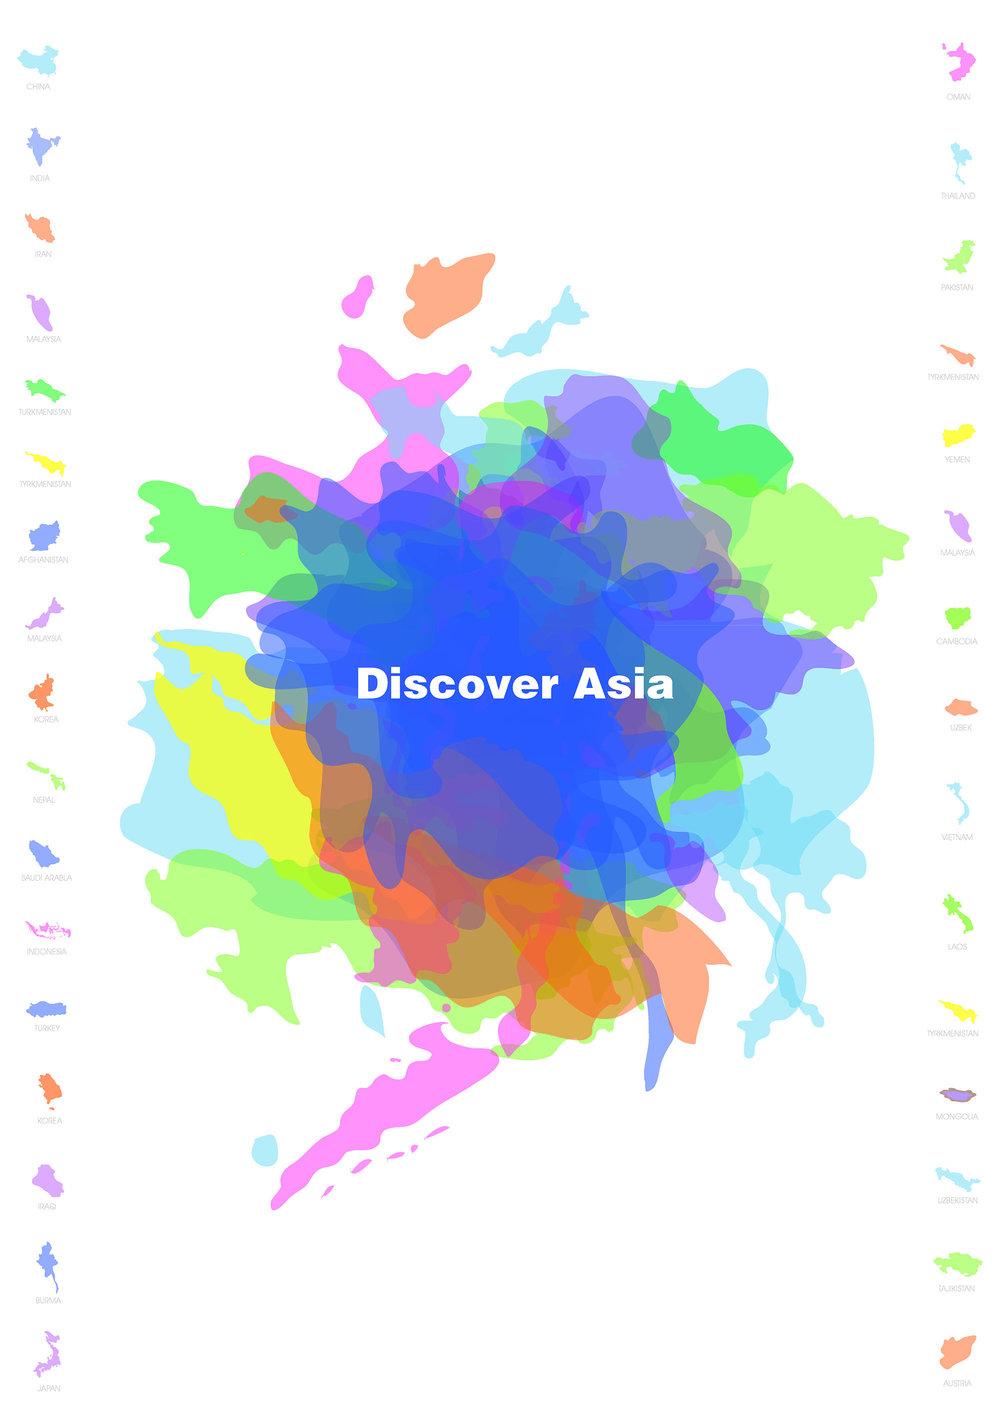 习慧婷[Discover Asia].jpg